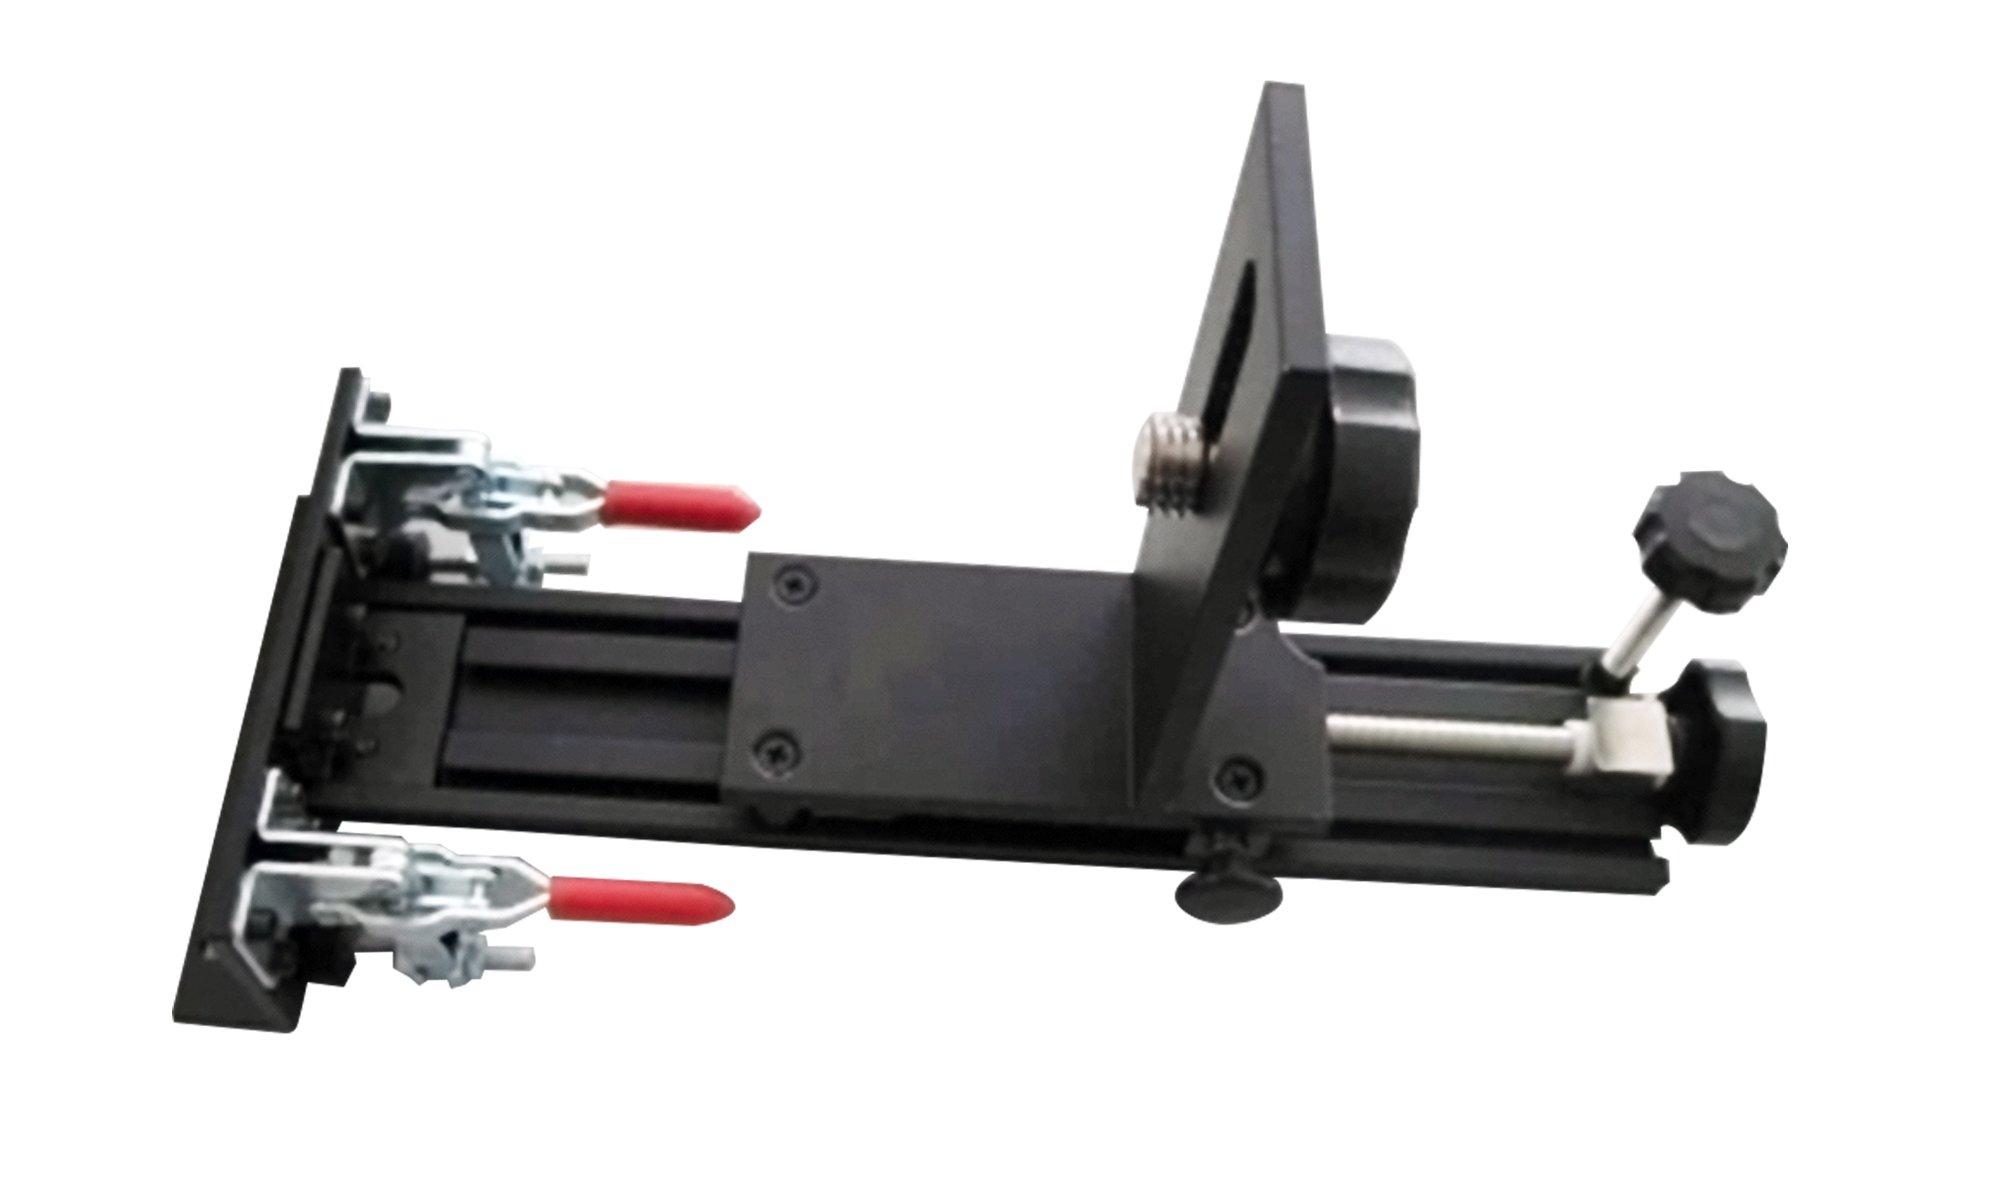 NWI NUCB05 Universal Wall Mount/Ceiling Bracket Adjustable